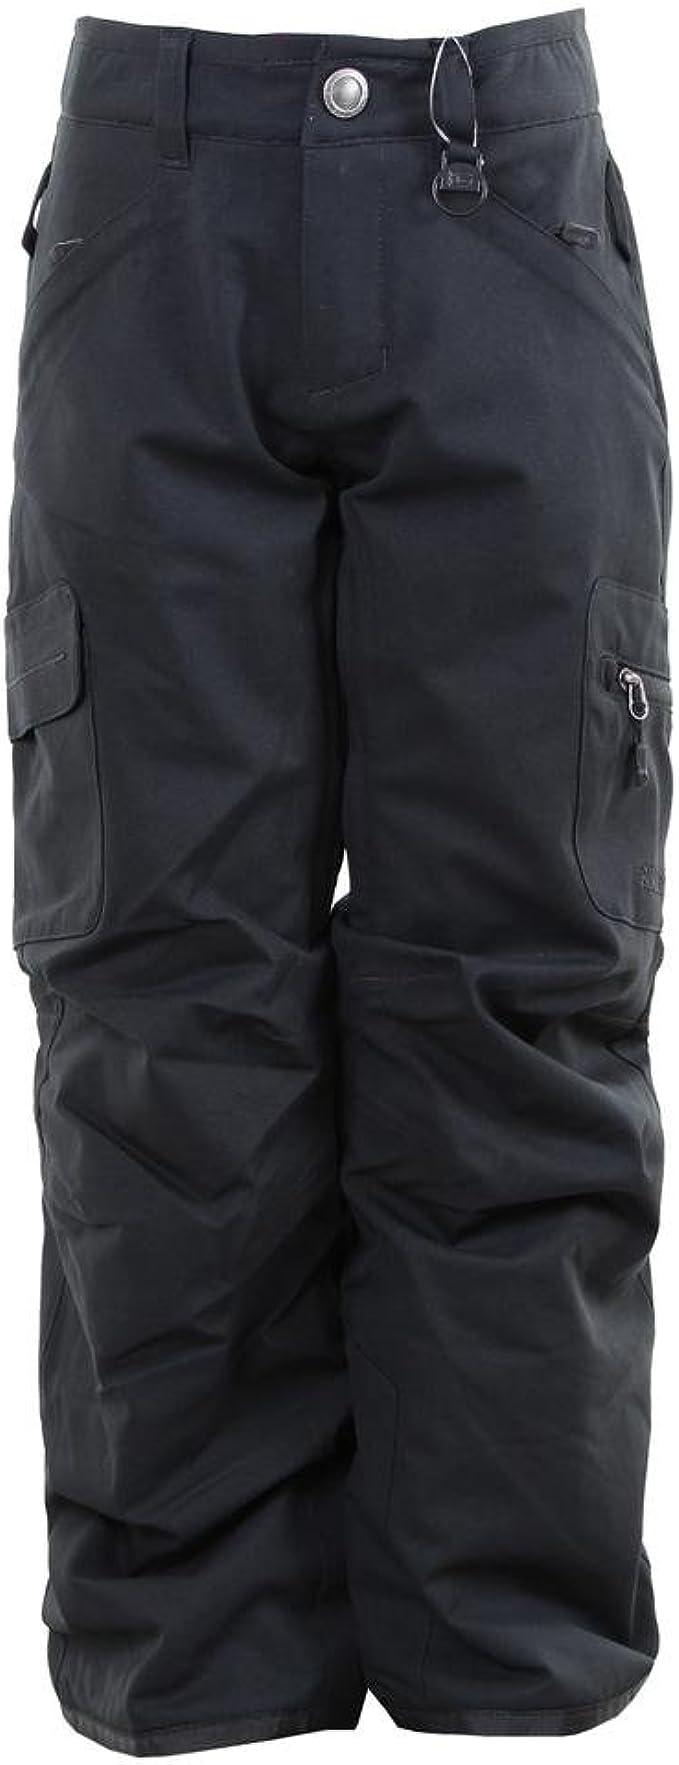 Boulder Gear Ravish Ski Pant Girls